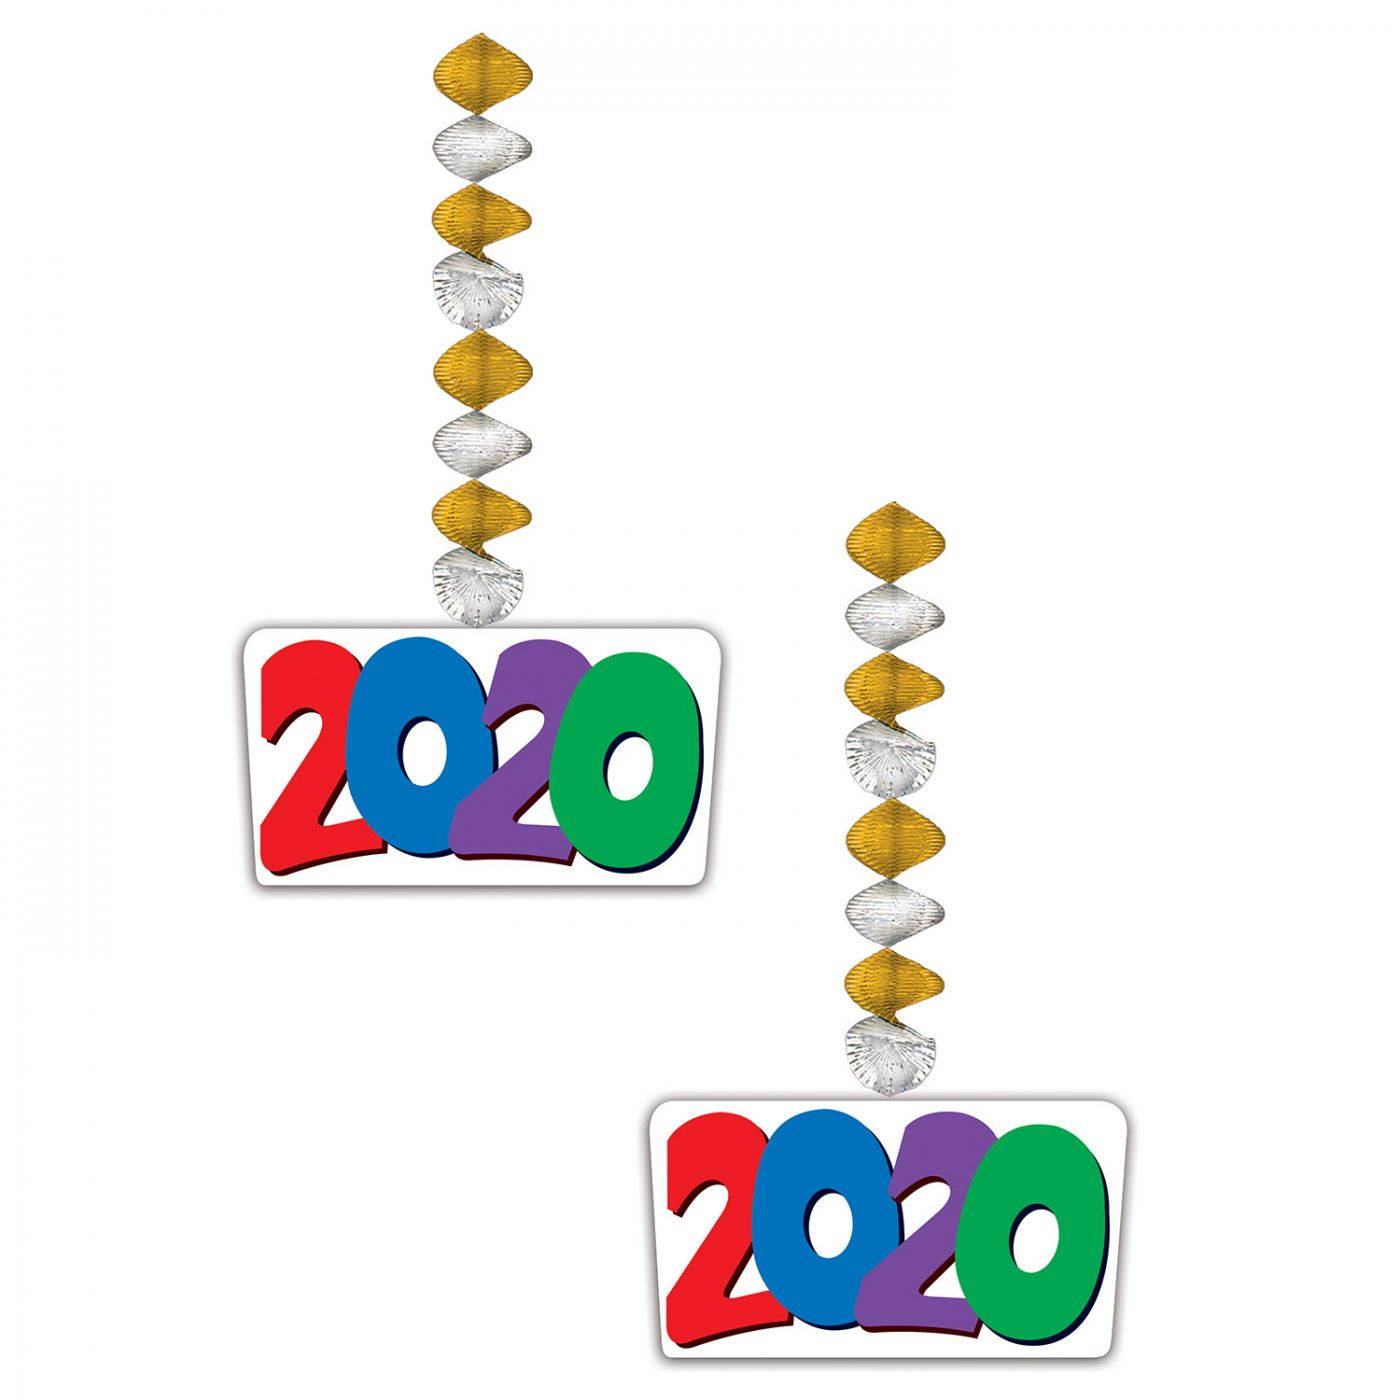 2020  Danglers image